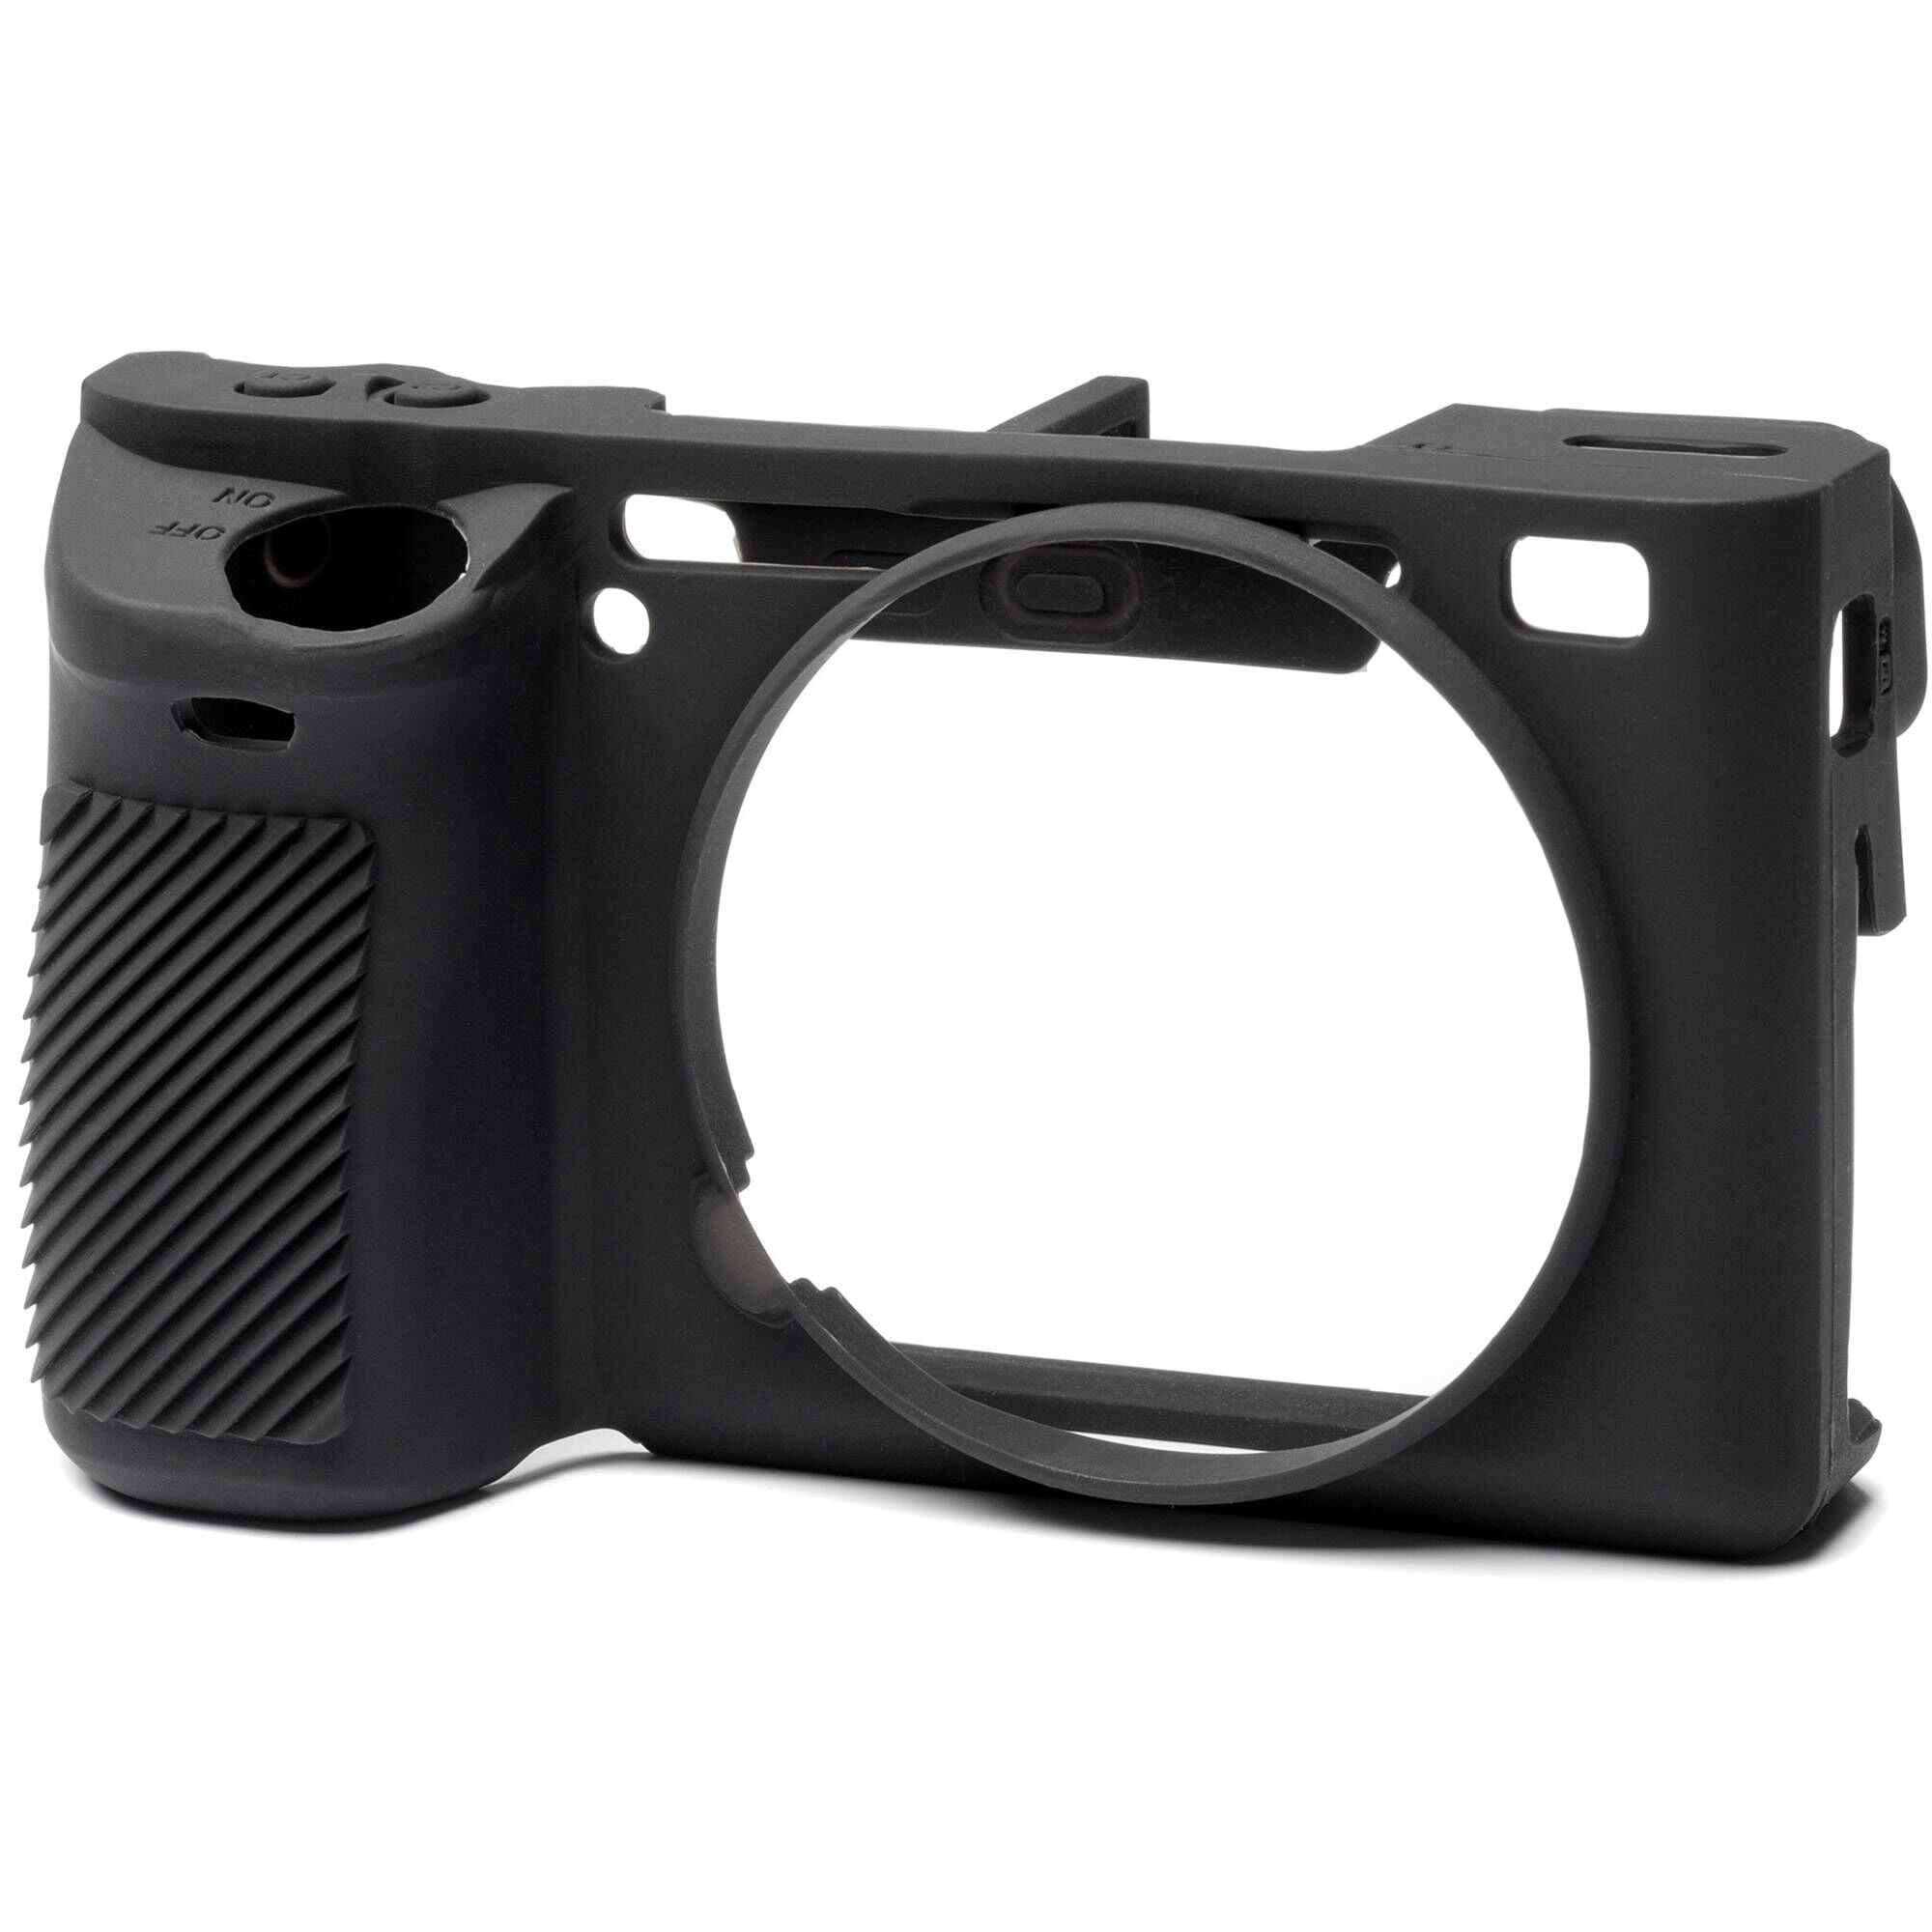 کاور دوربین پلوز مدل ILCE مناسب برای دوربین سونی A6500